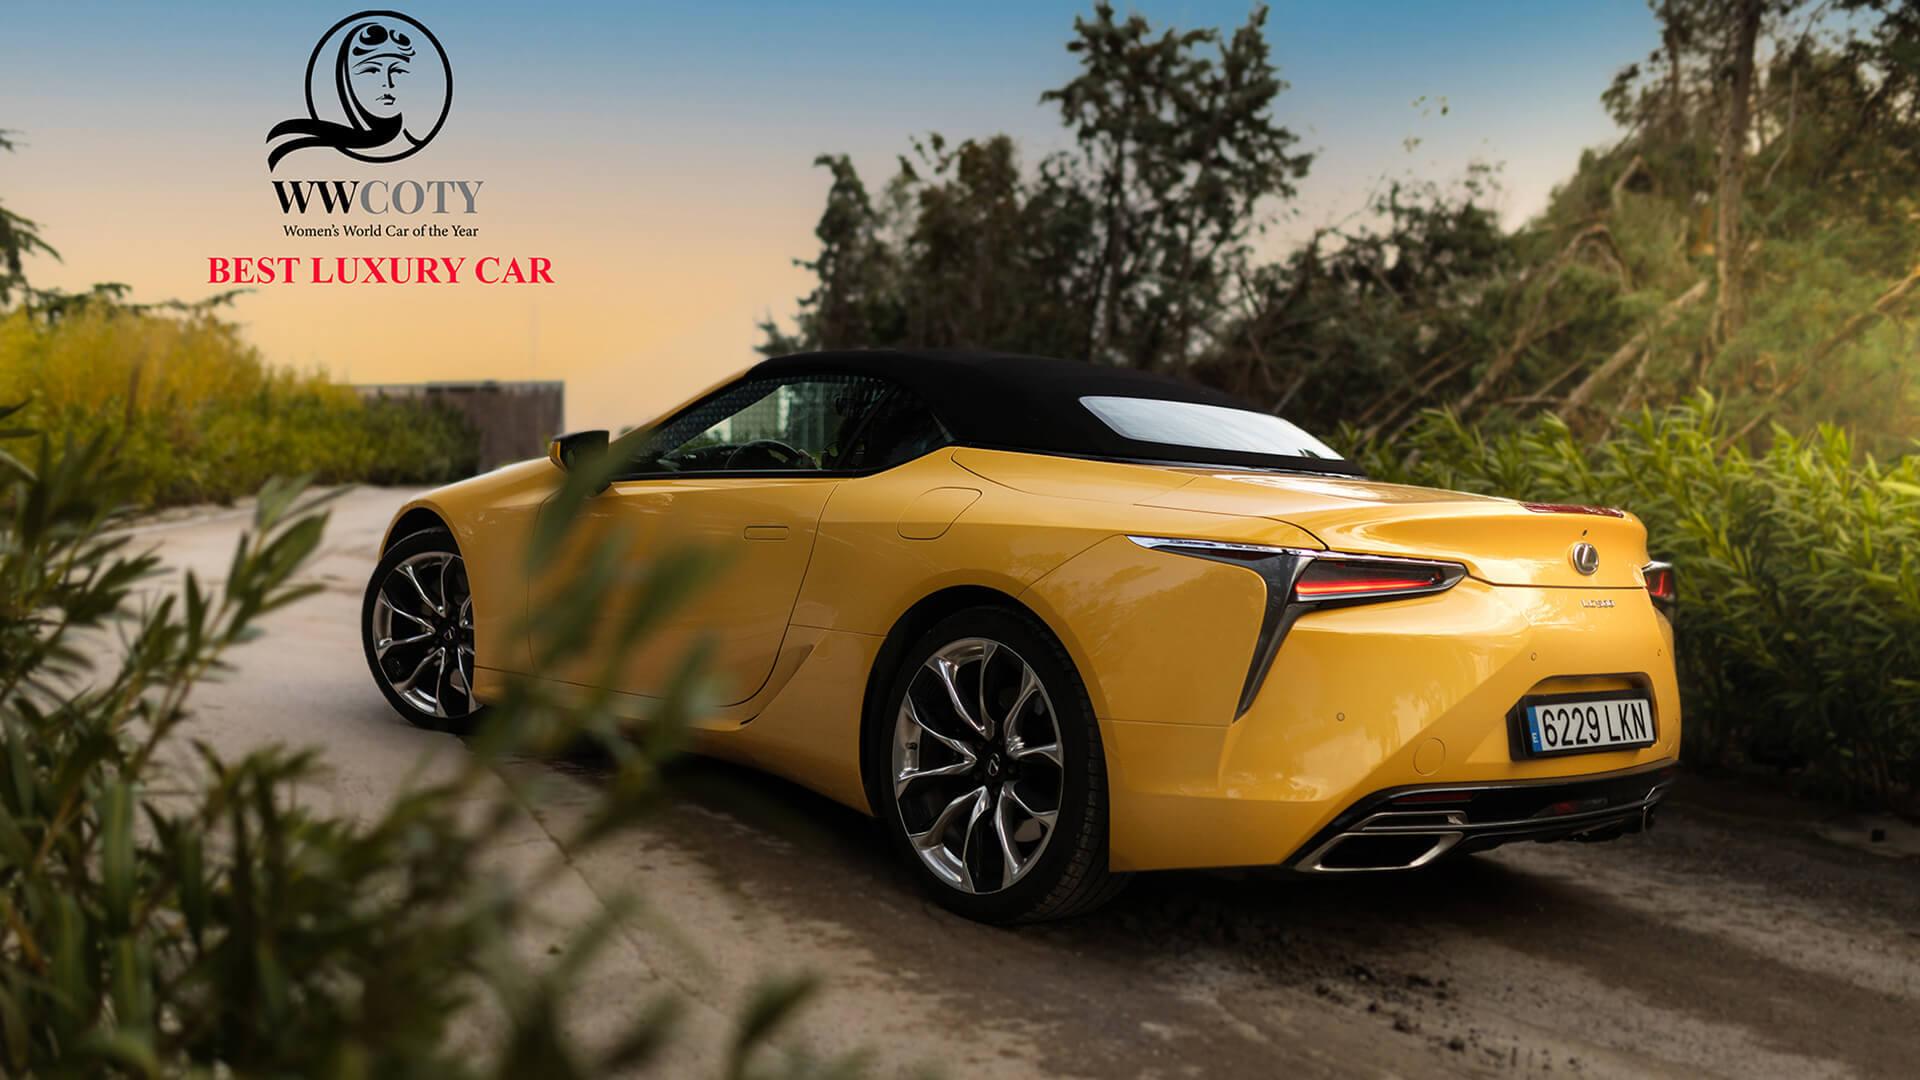 LC Convertible Best Luxury Car Award Hero Image